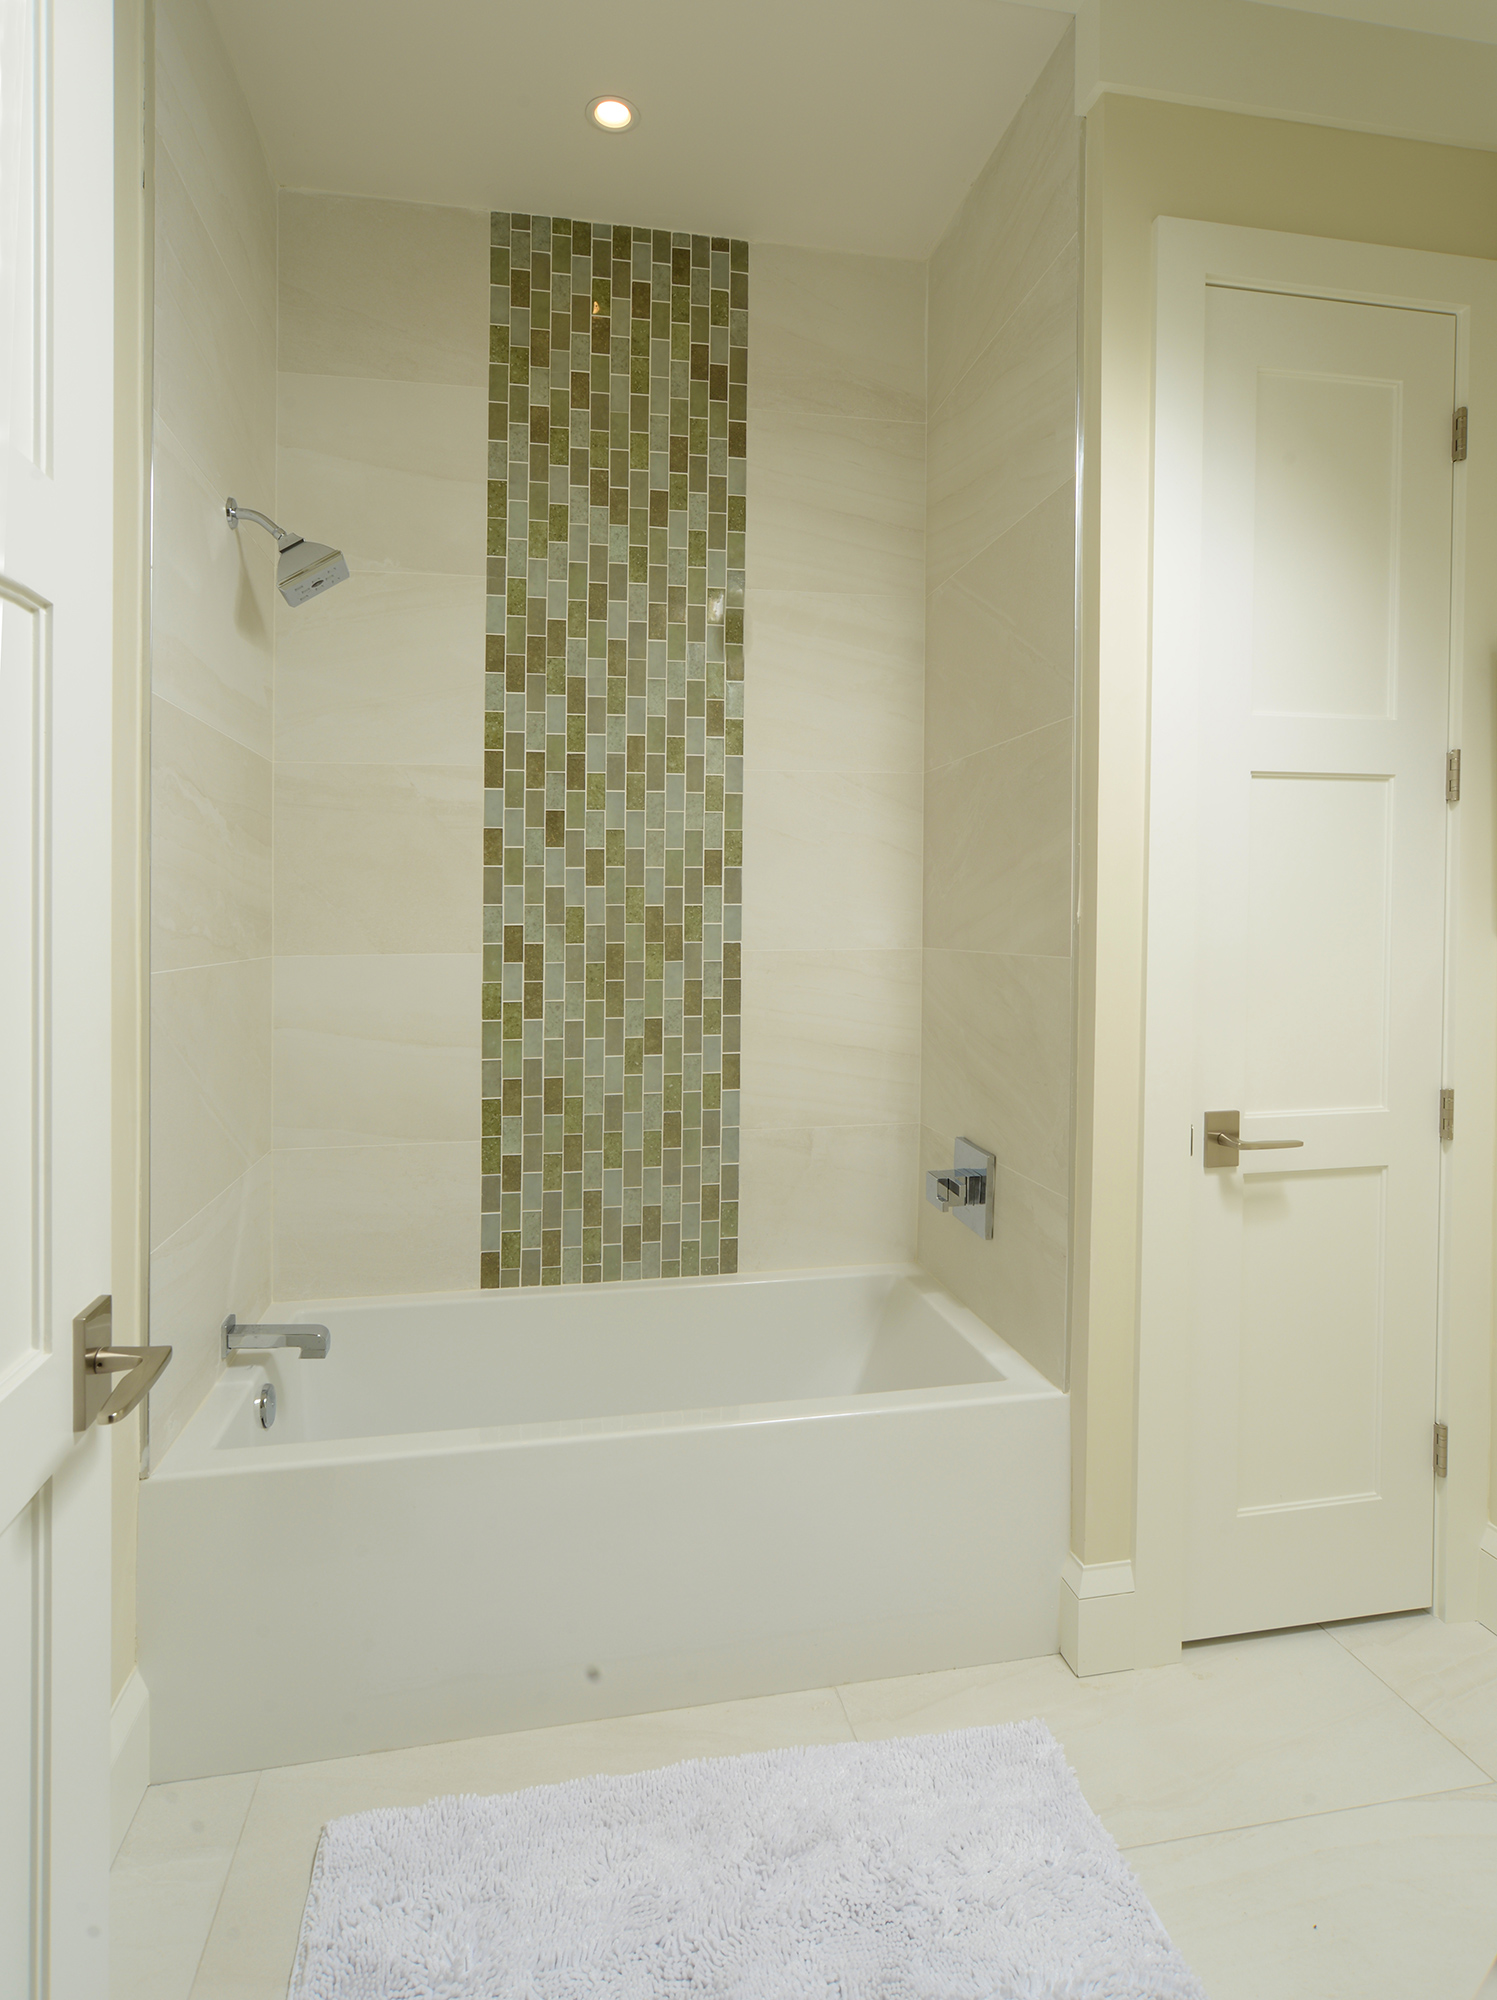 Bathroom Remodeling Vero Beach Fl bathroom photos & ideas from vero beach | dunlap construction